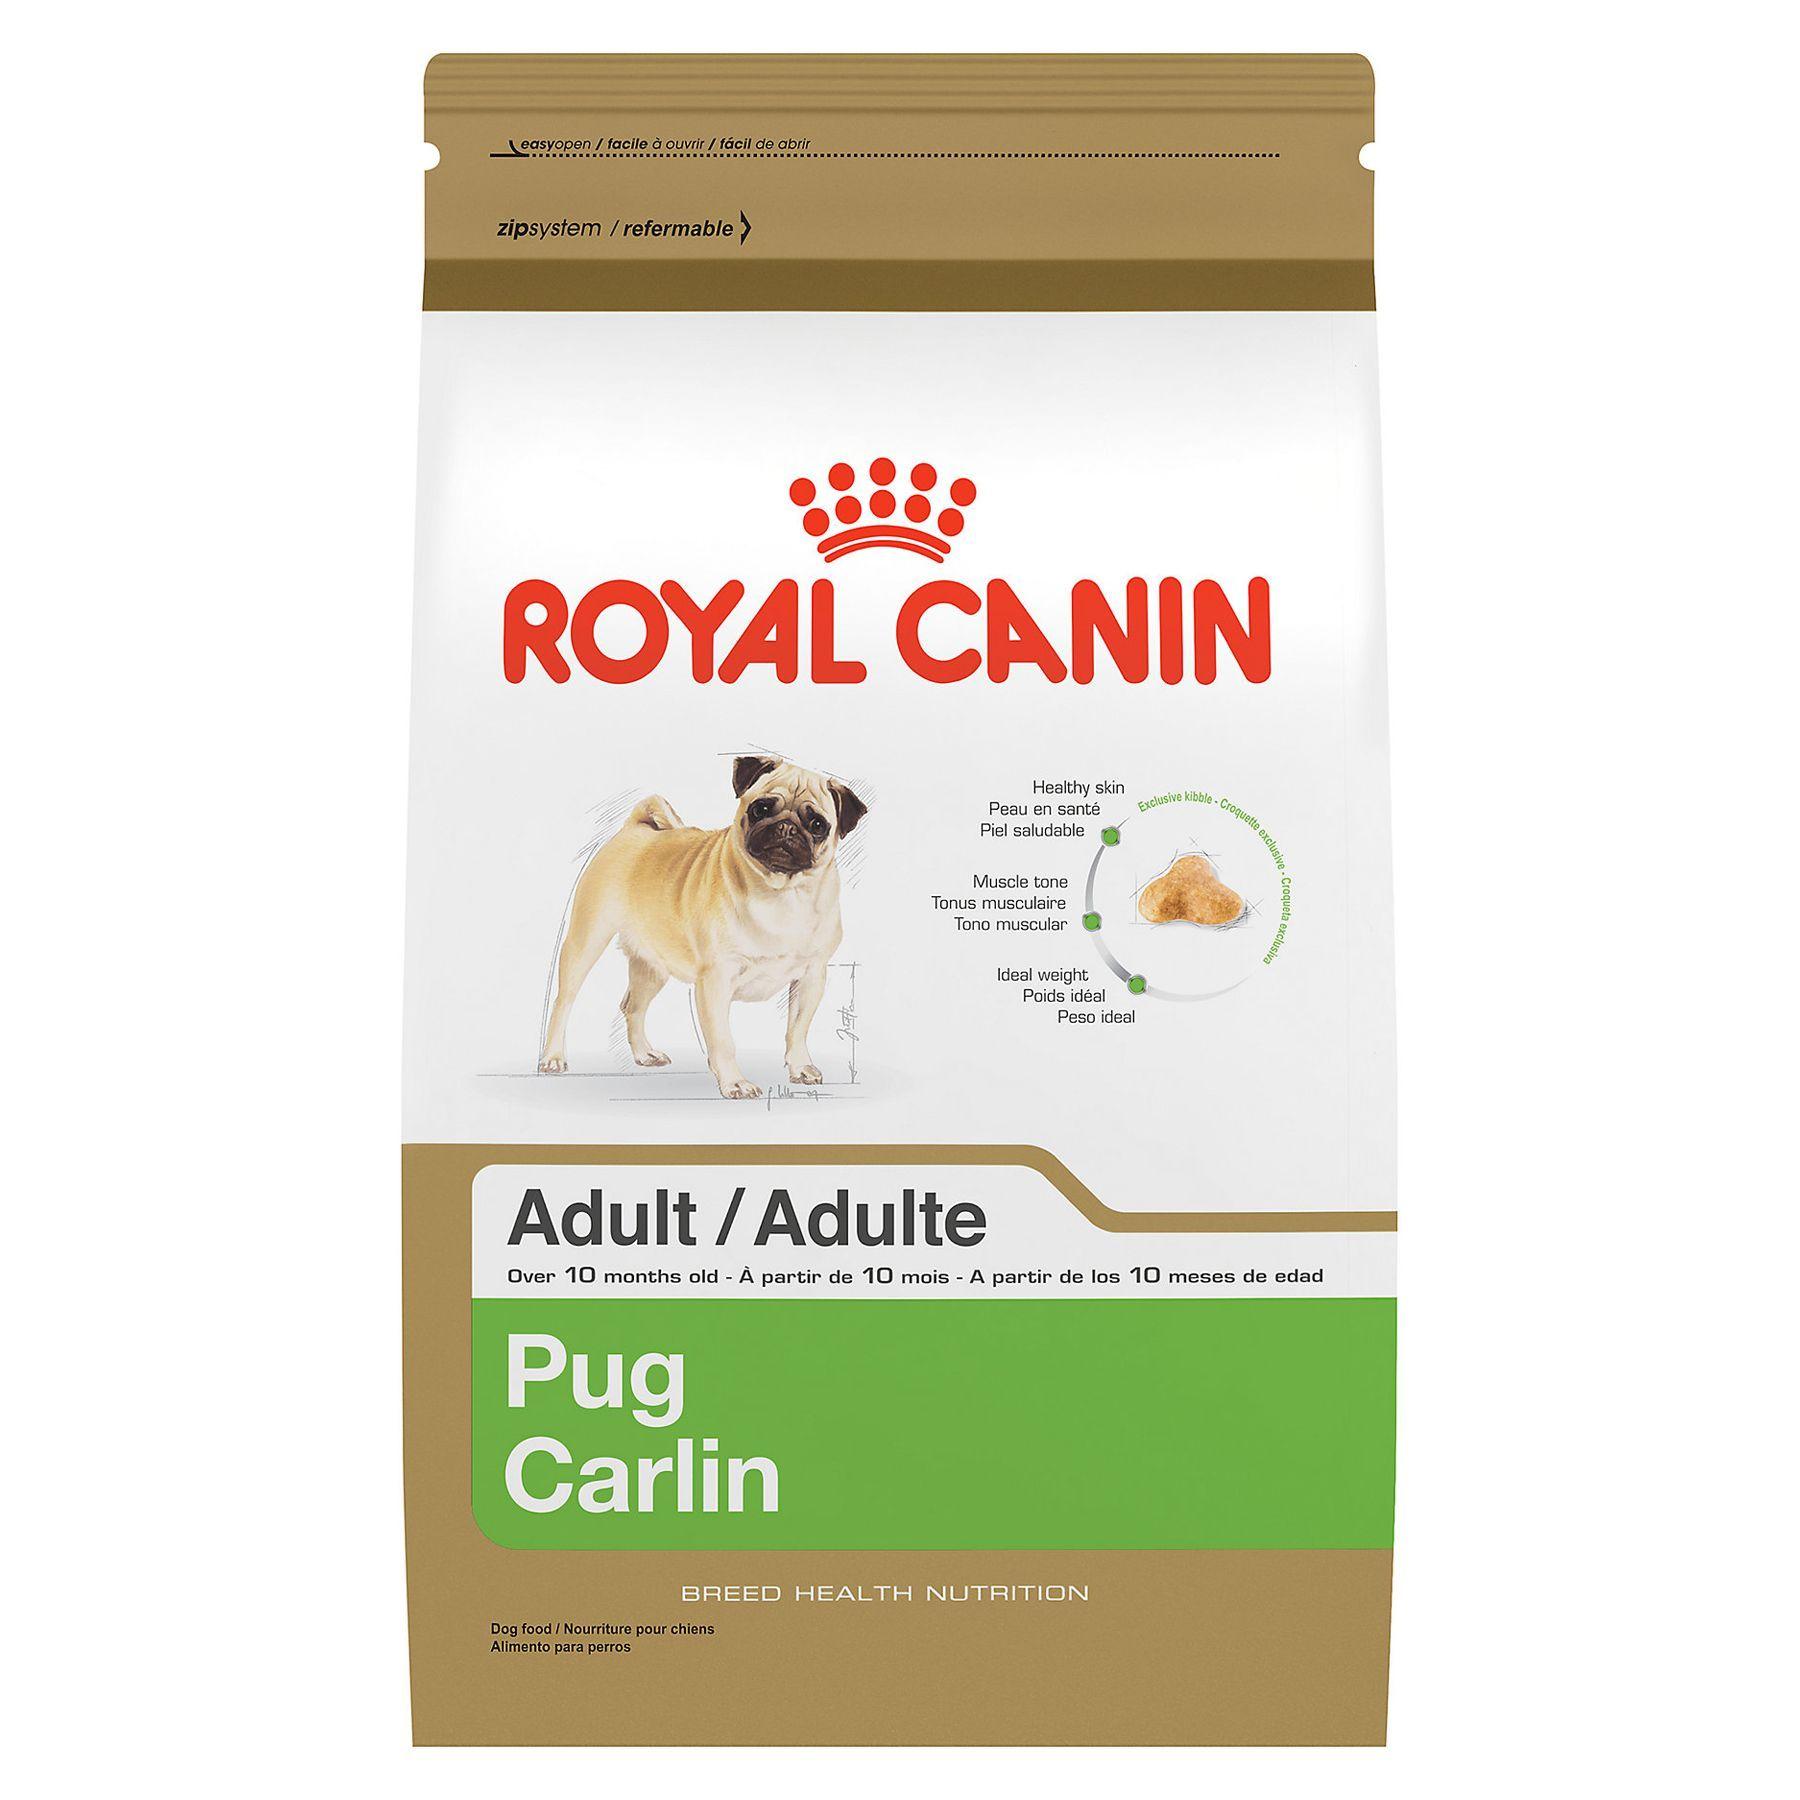 Royal Canin Breed Health Nutrition Pug Adult Dog Food Size 2 5